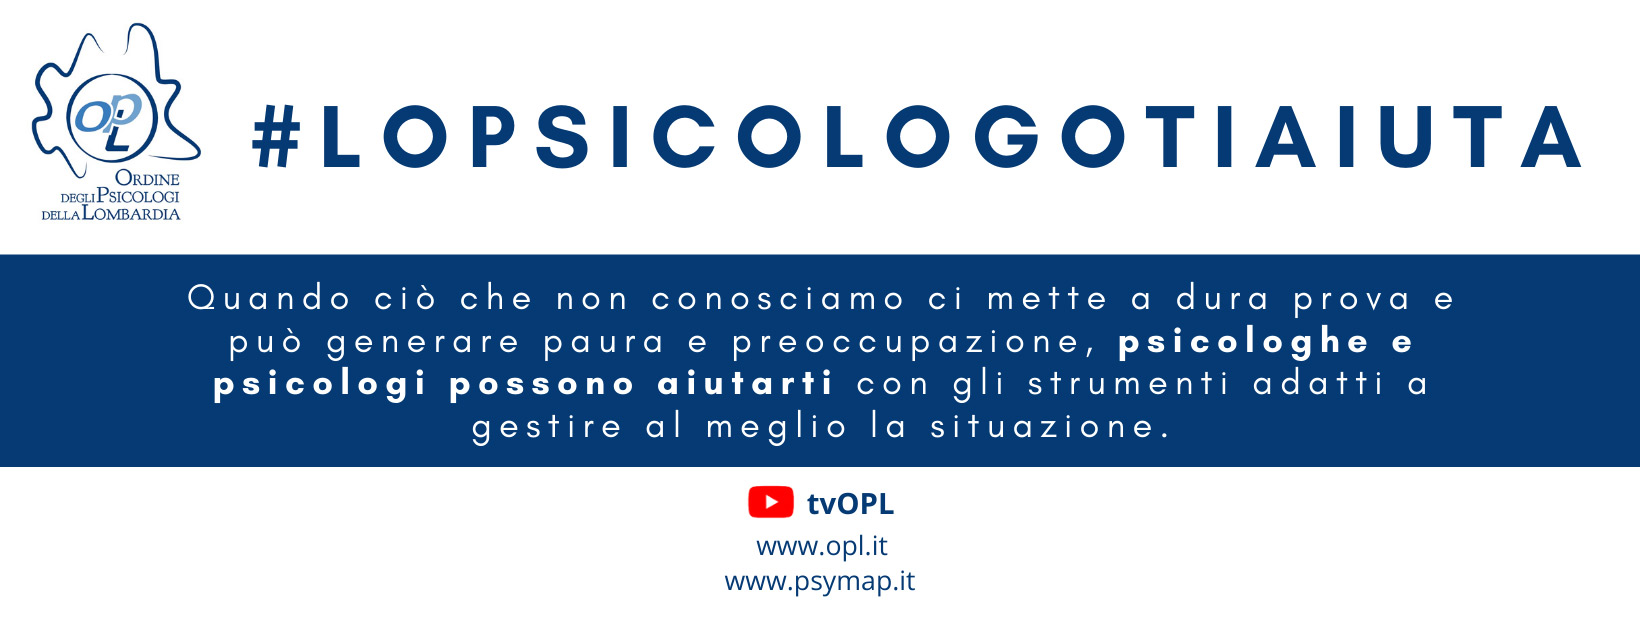 #LOPSICOLOGOTIAIUTA